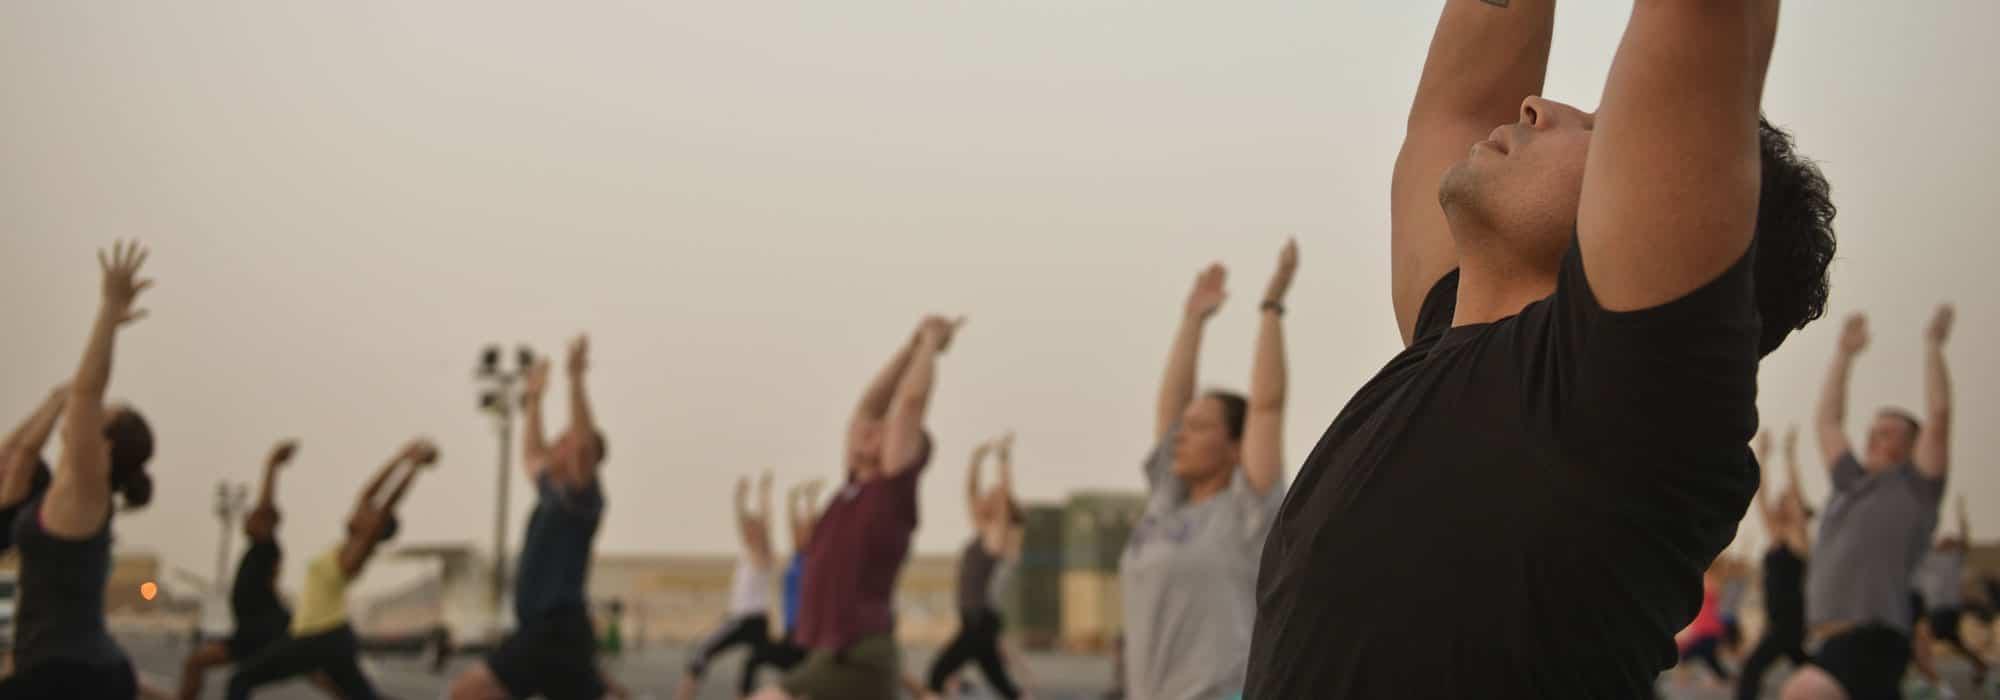 yoga jedermann